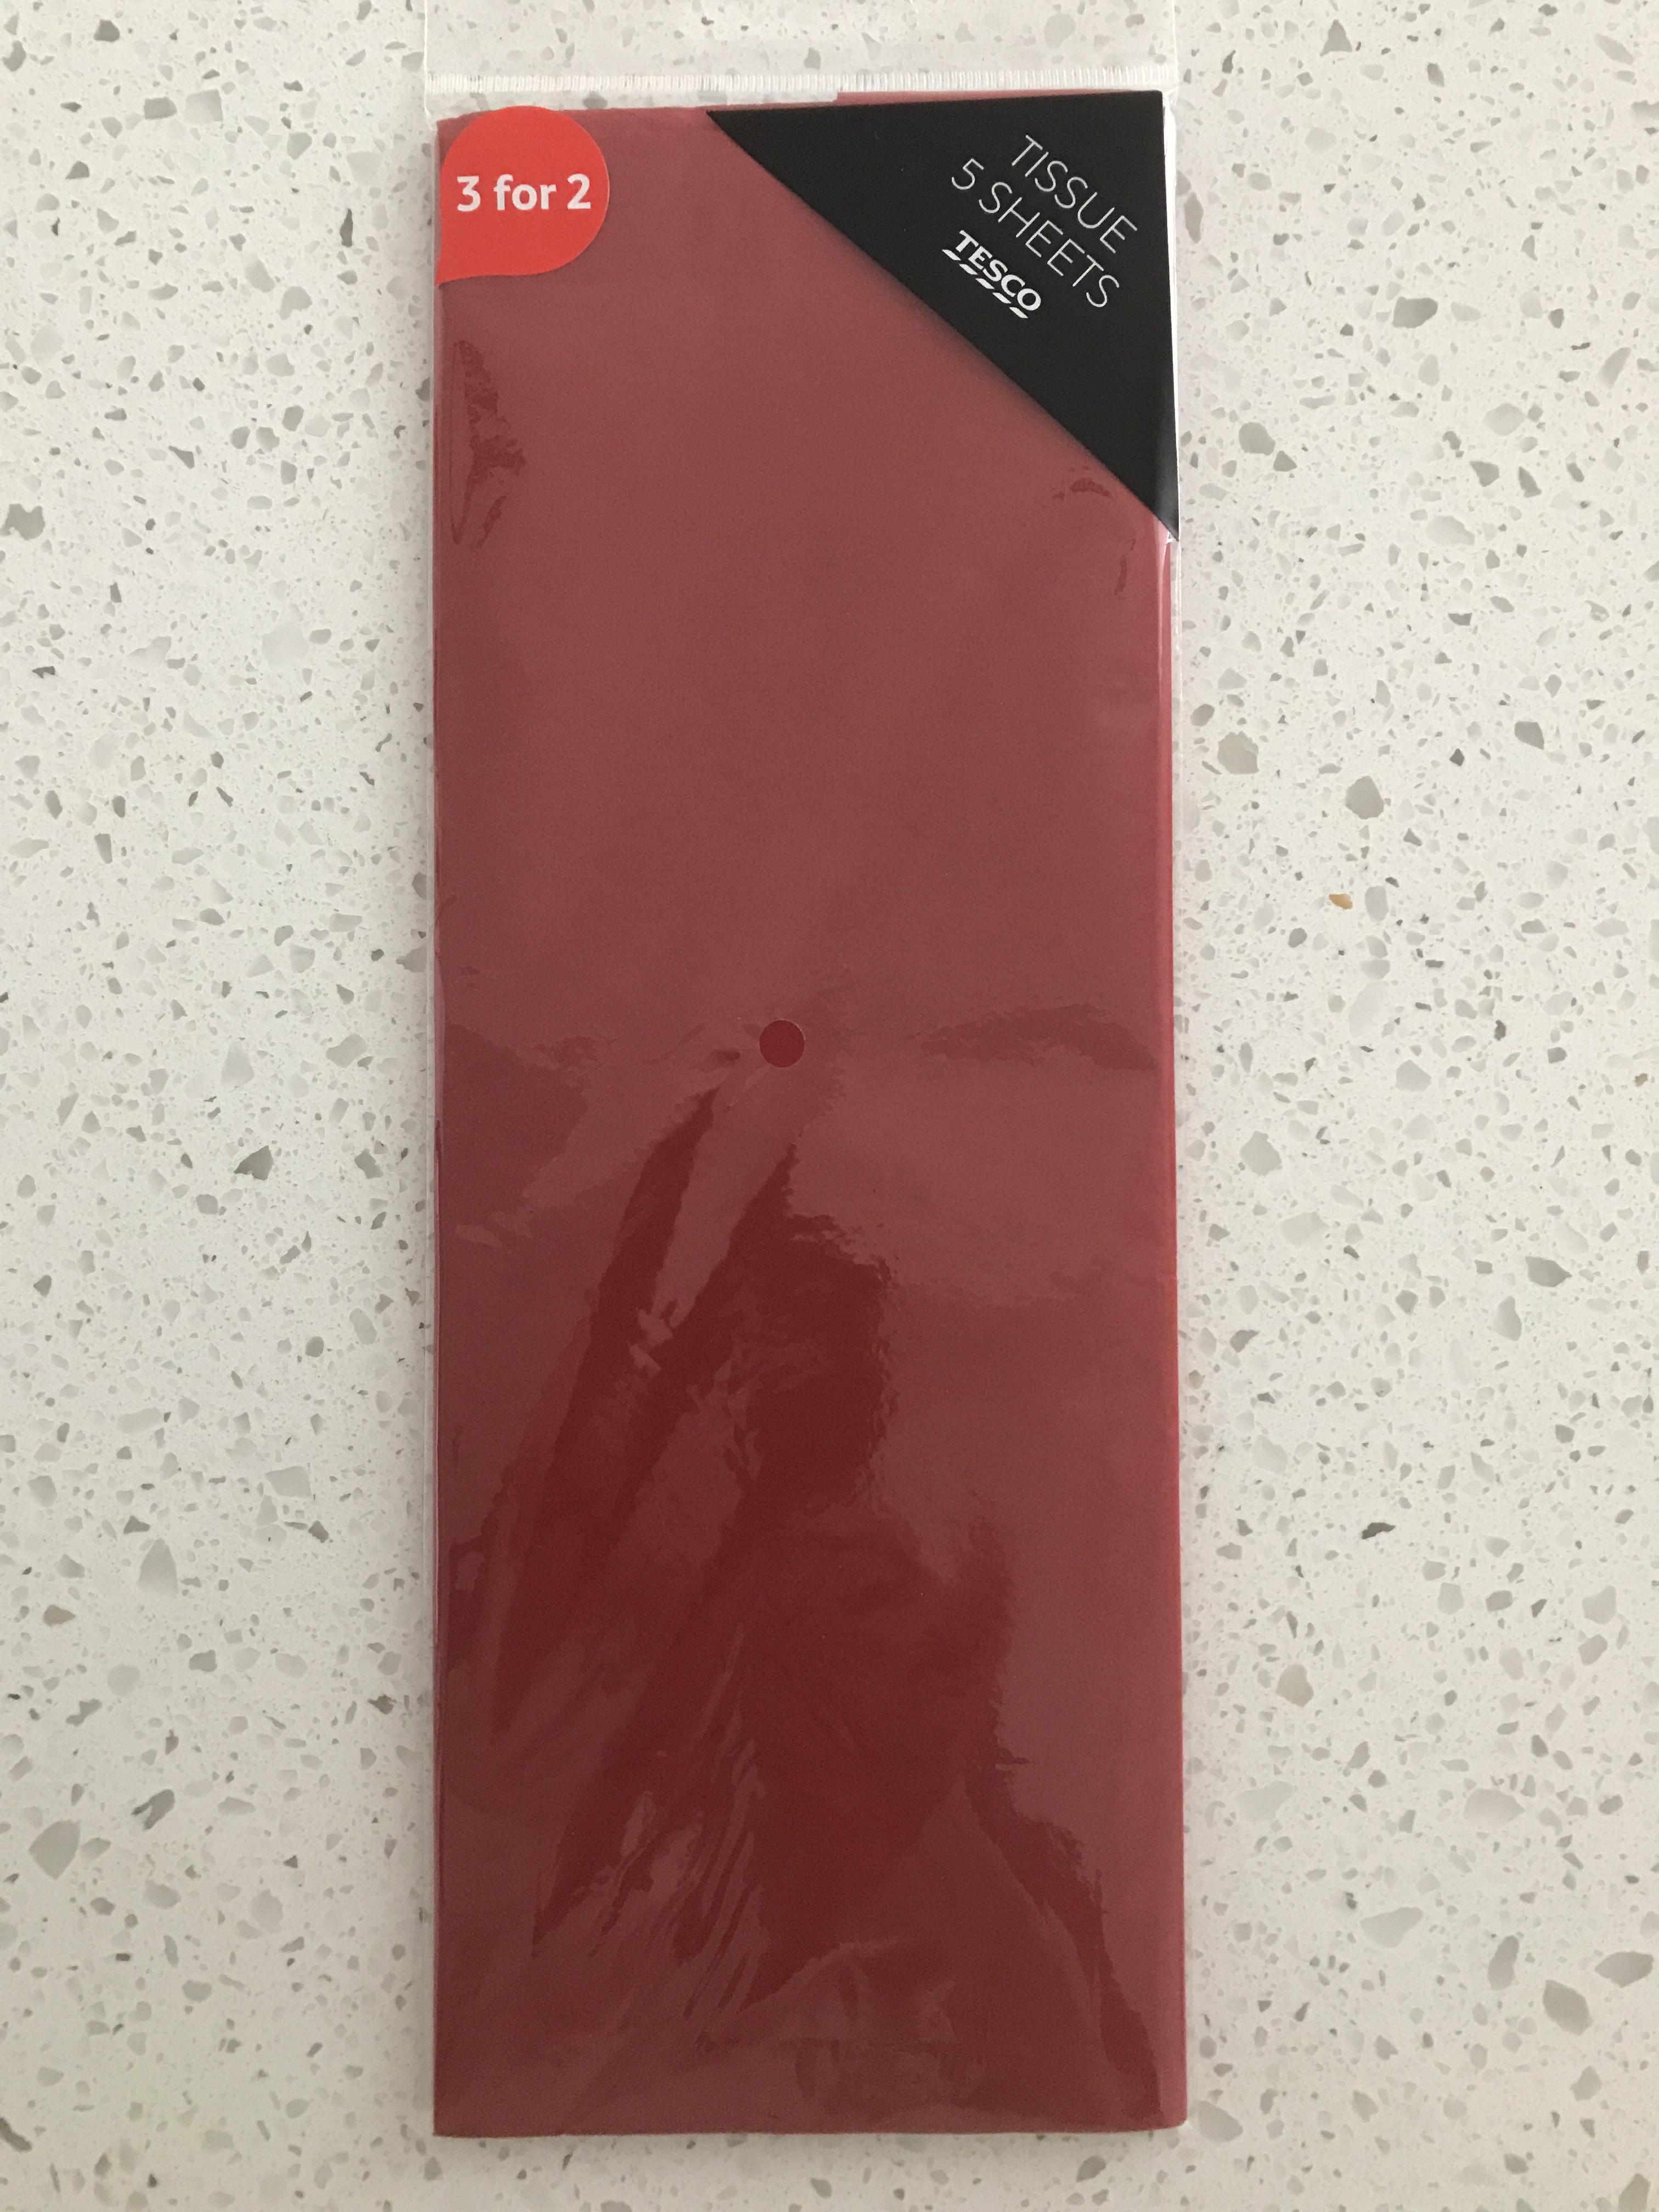 Tesco Tissue Paper scanning at 25p